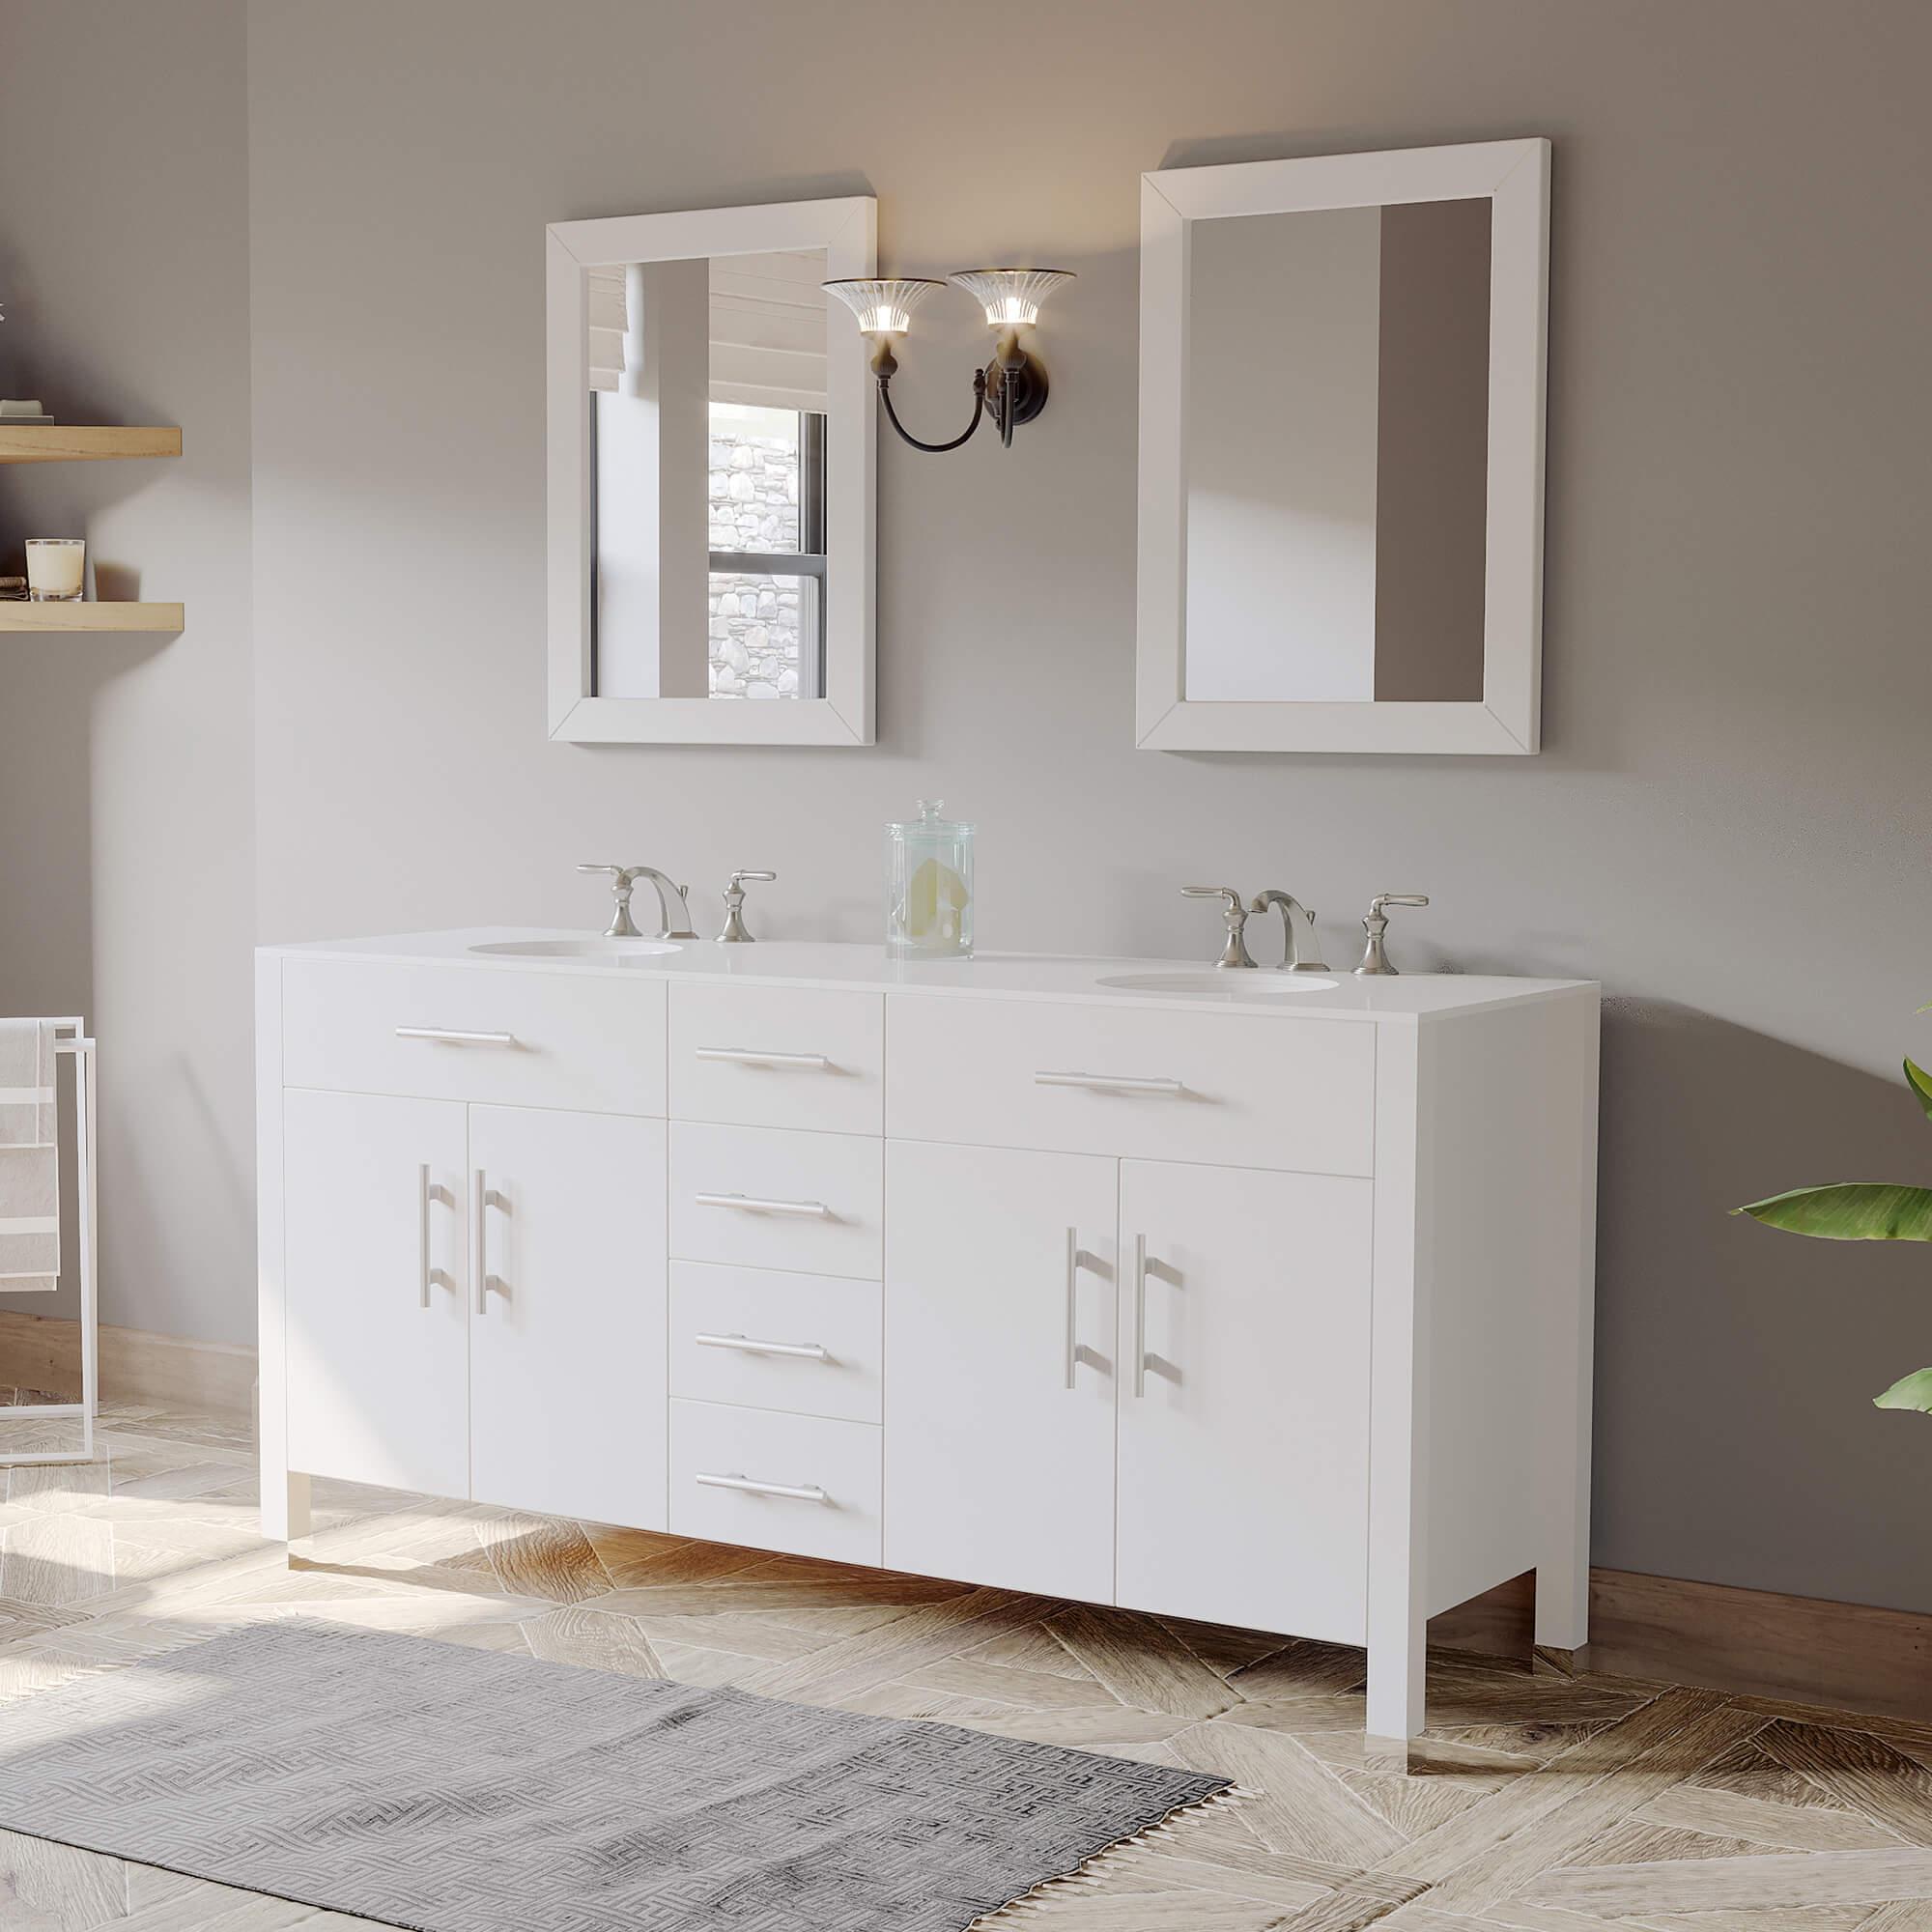 white bathroom vanity set, double basin sinks,